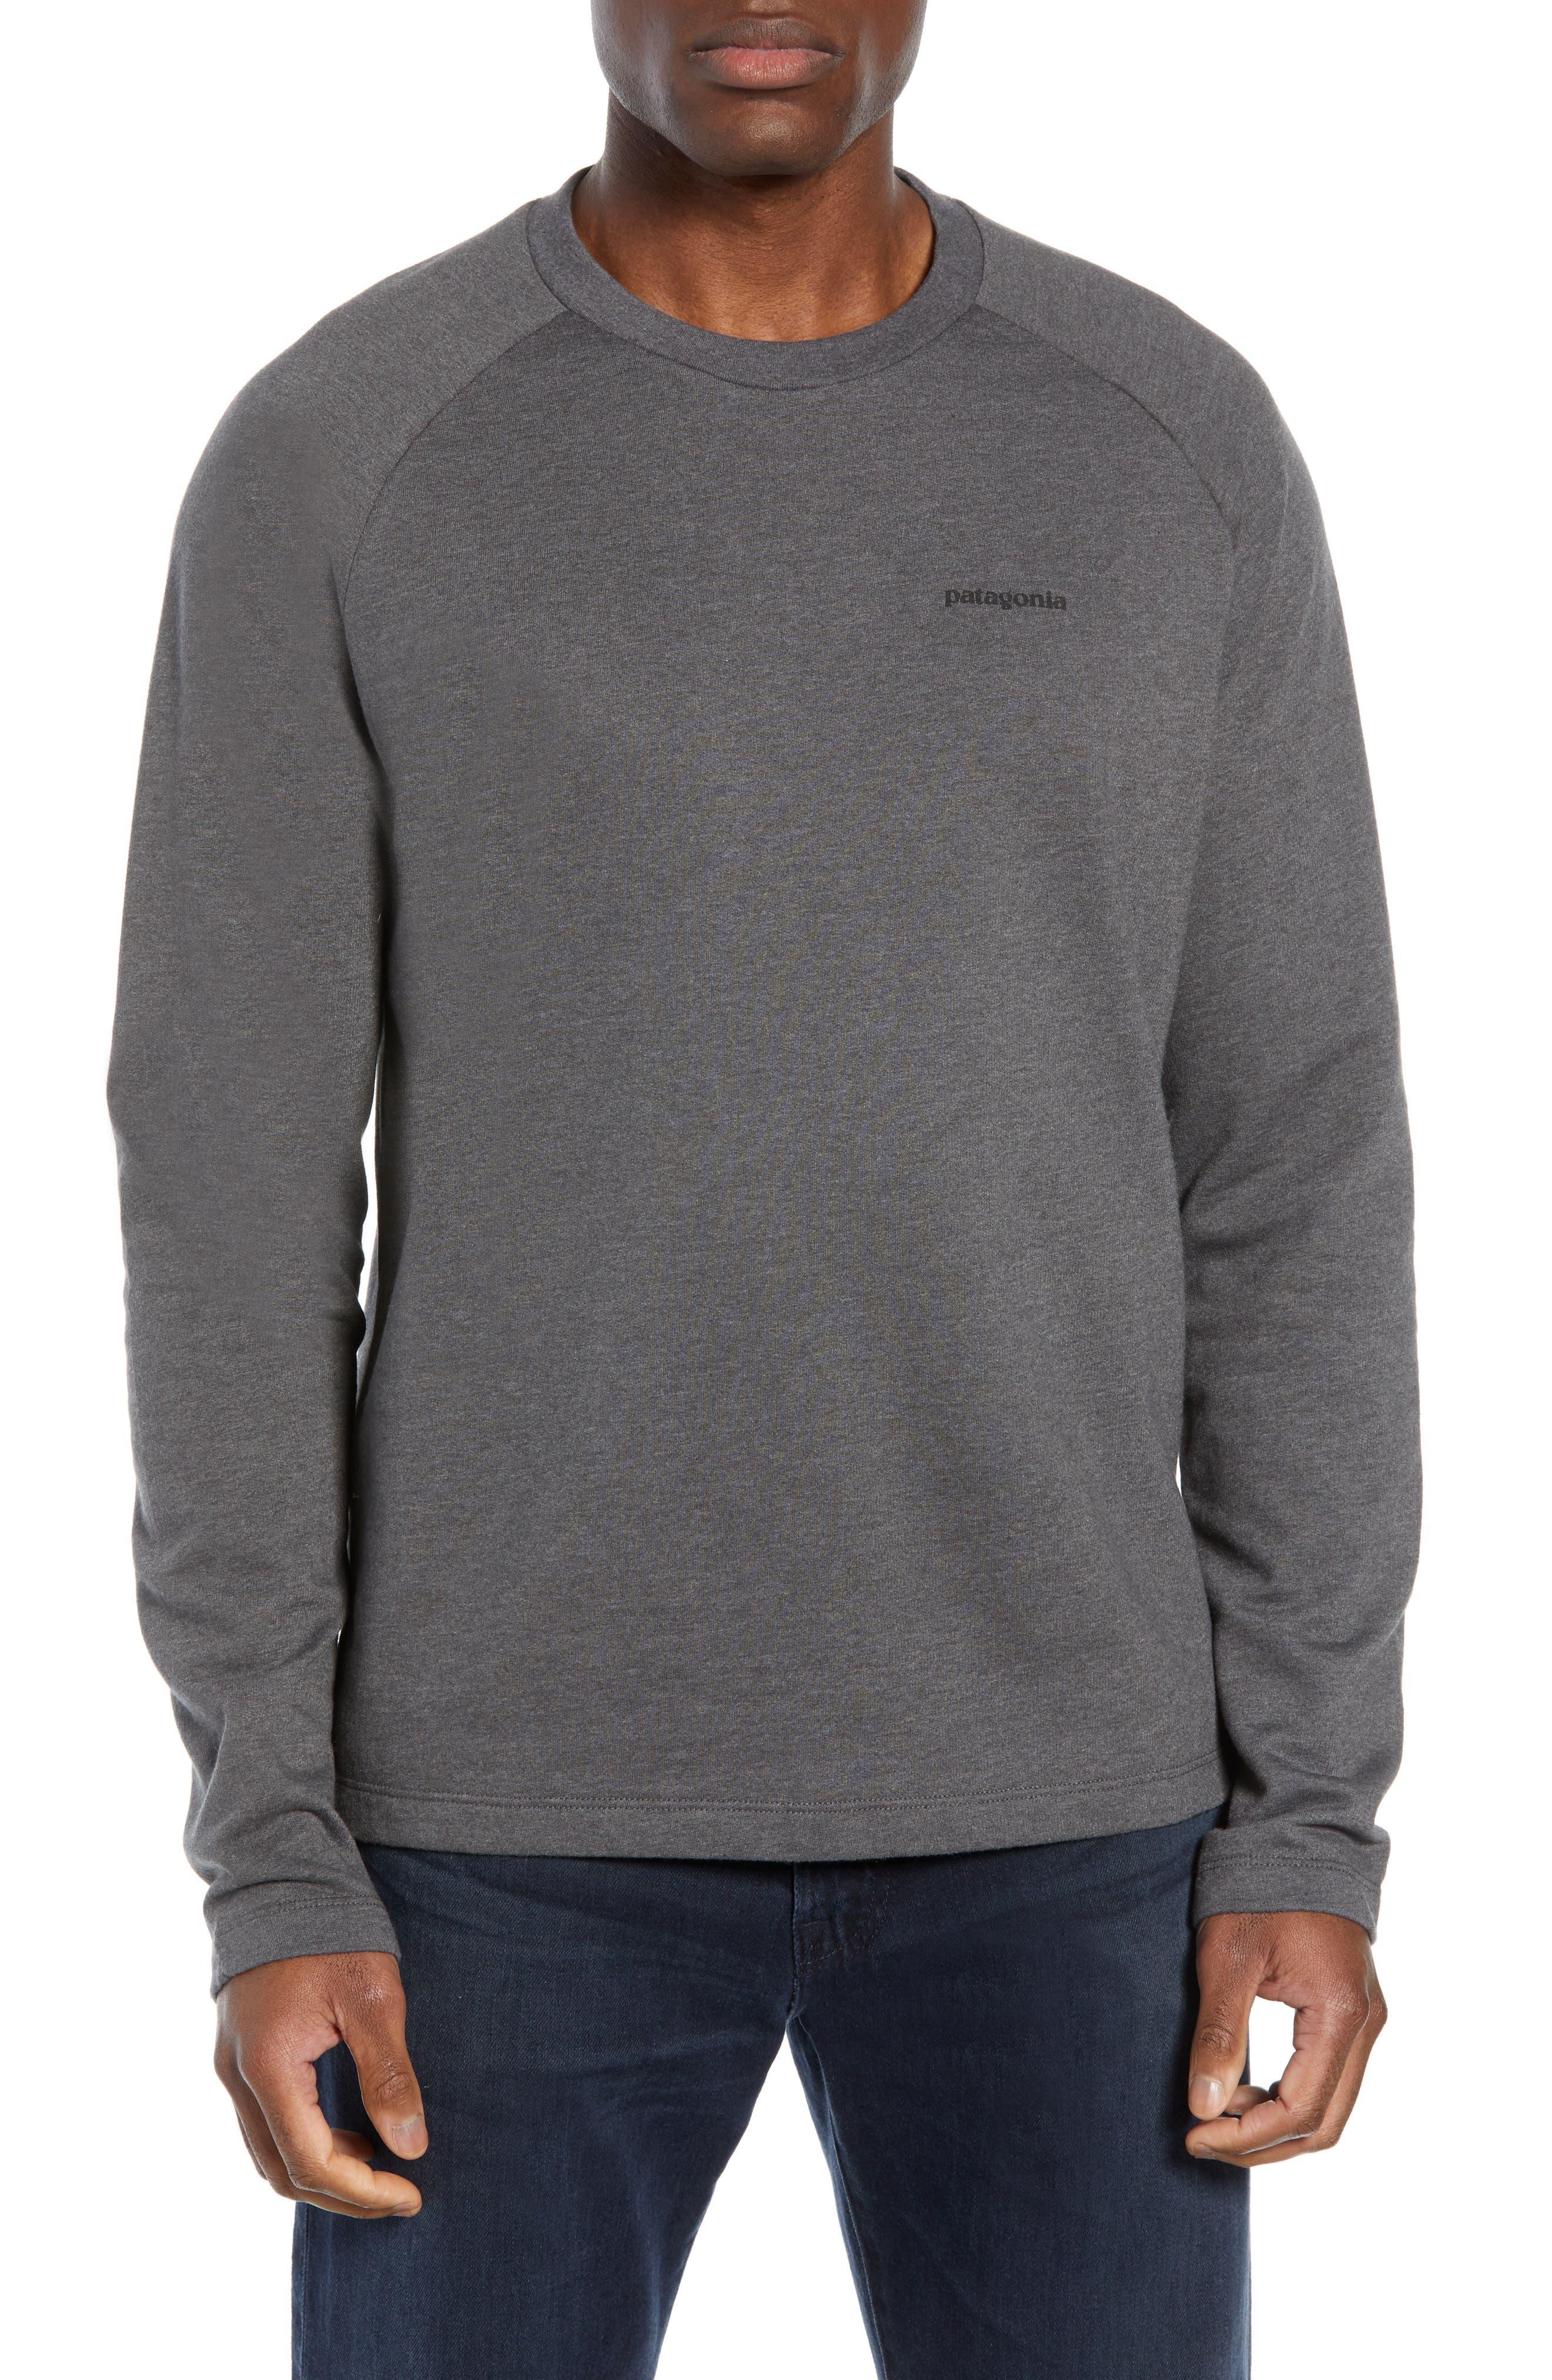 PATAGONIA P-6 Logo Slim Fit Lightweight Sweatshirt, Main, color, FORGE GREY